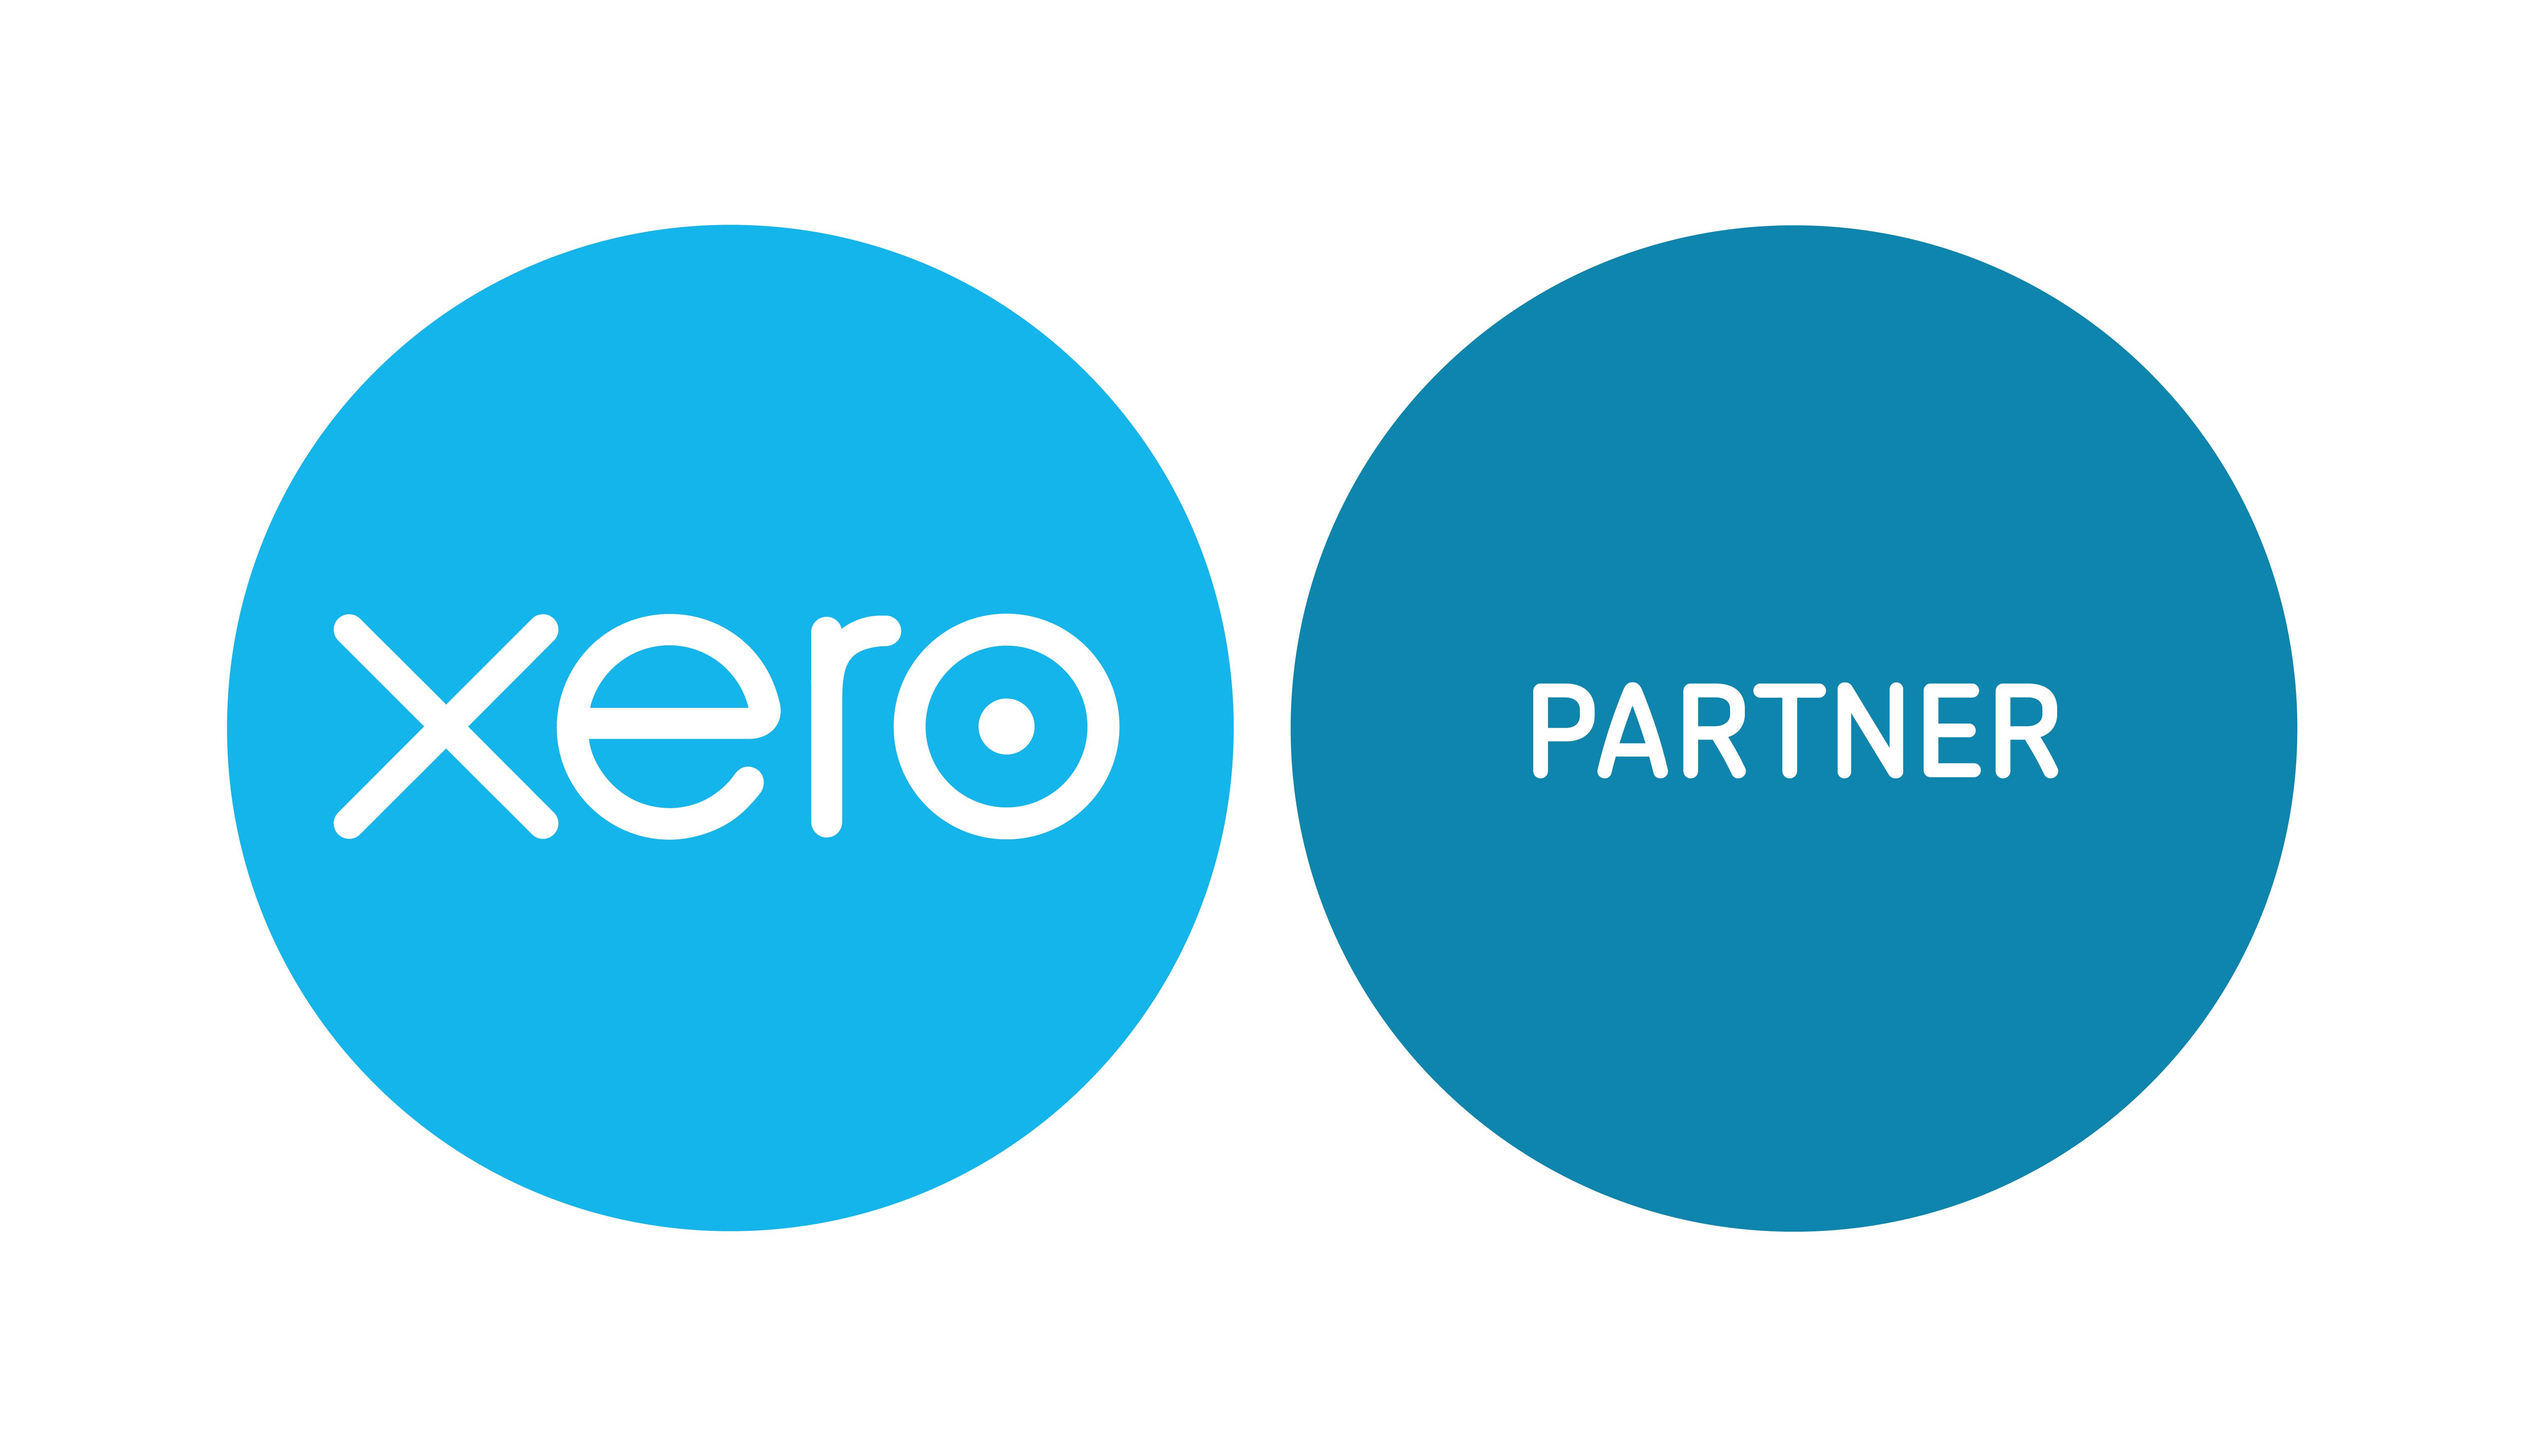 Xero Partner - Your Office